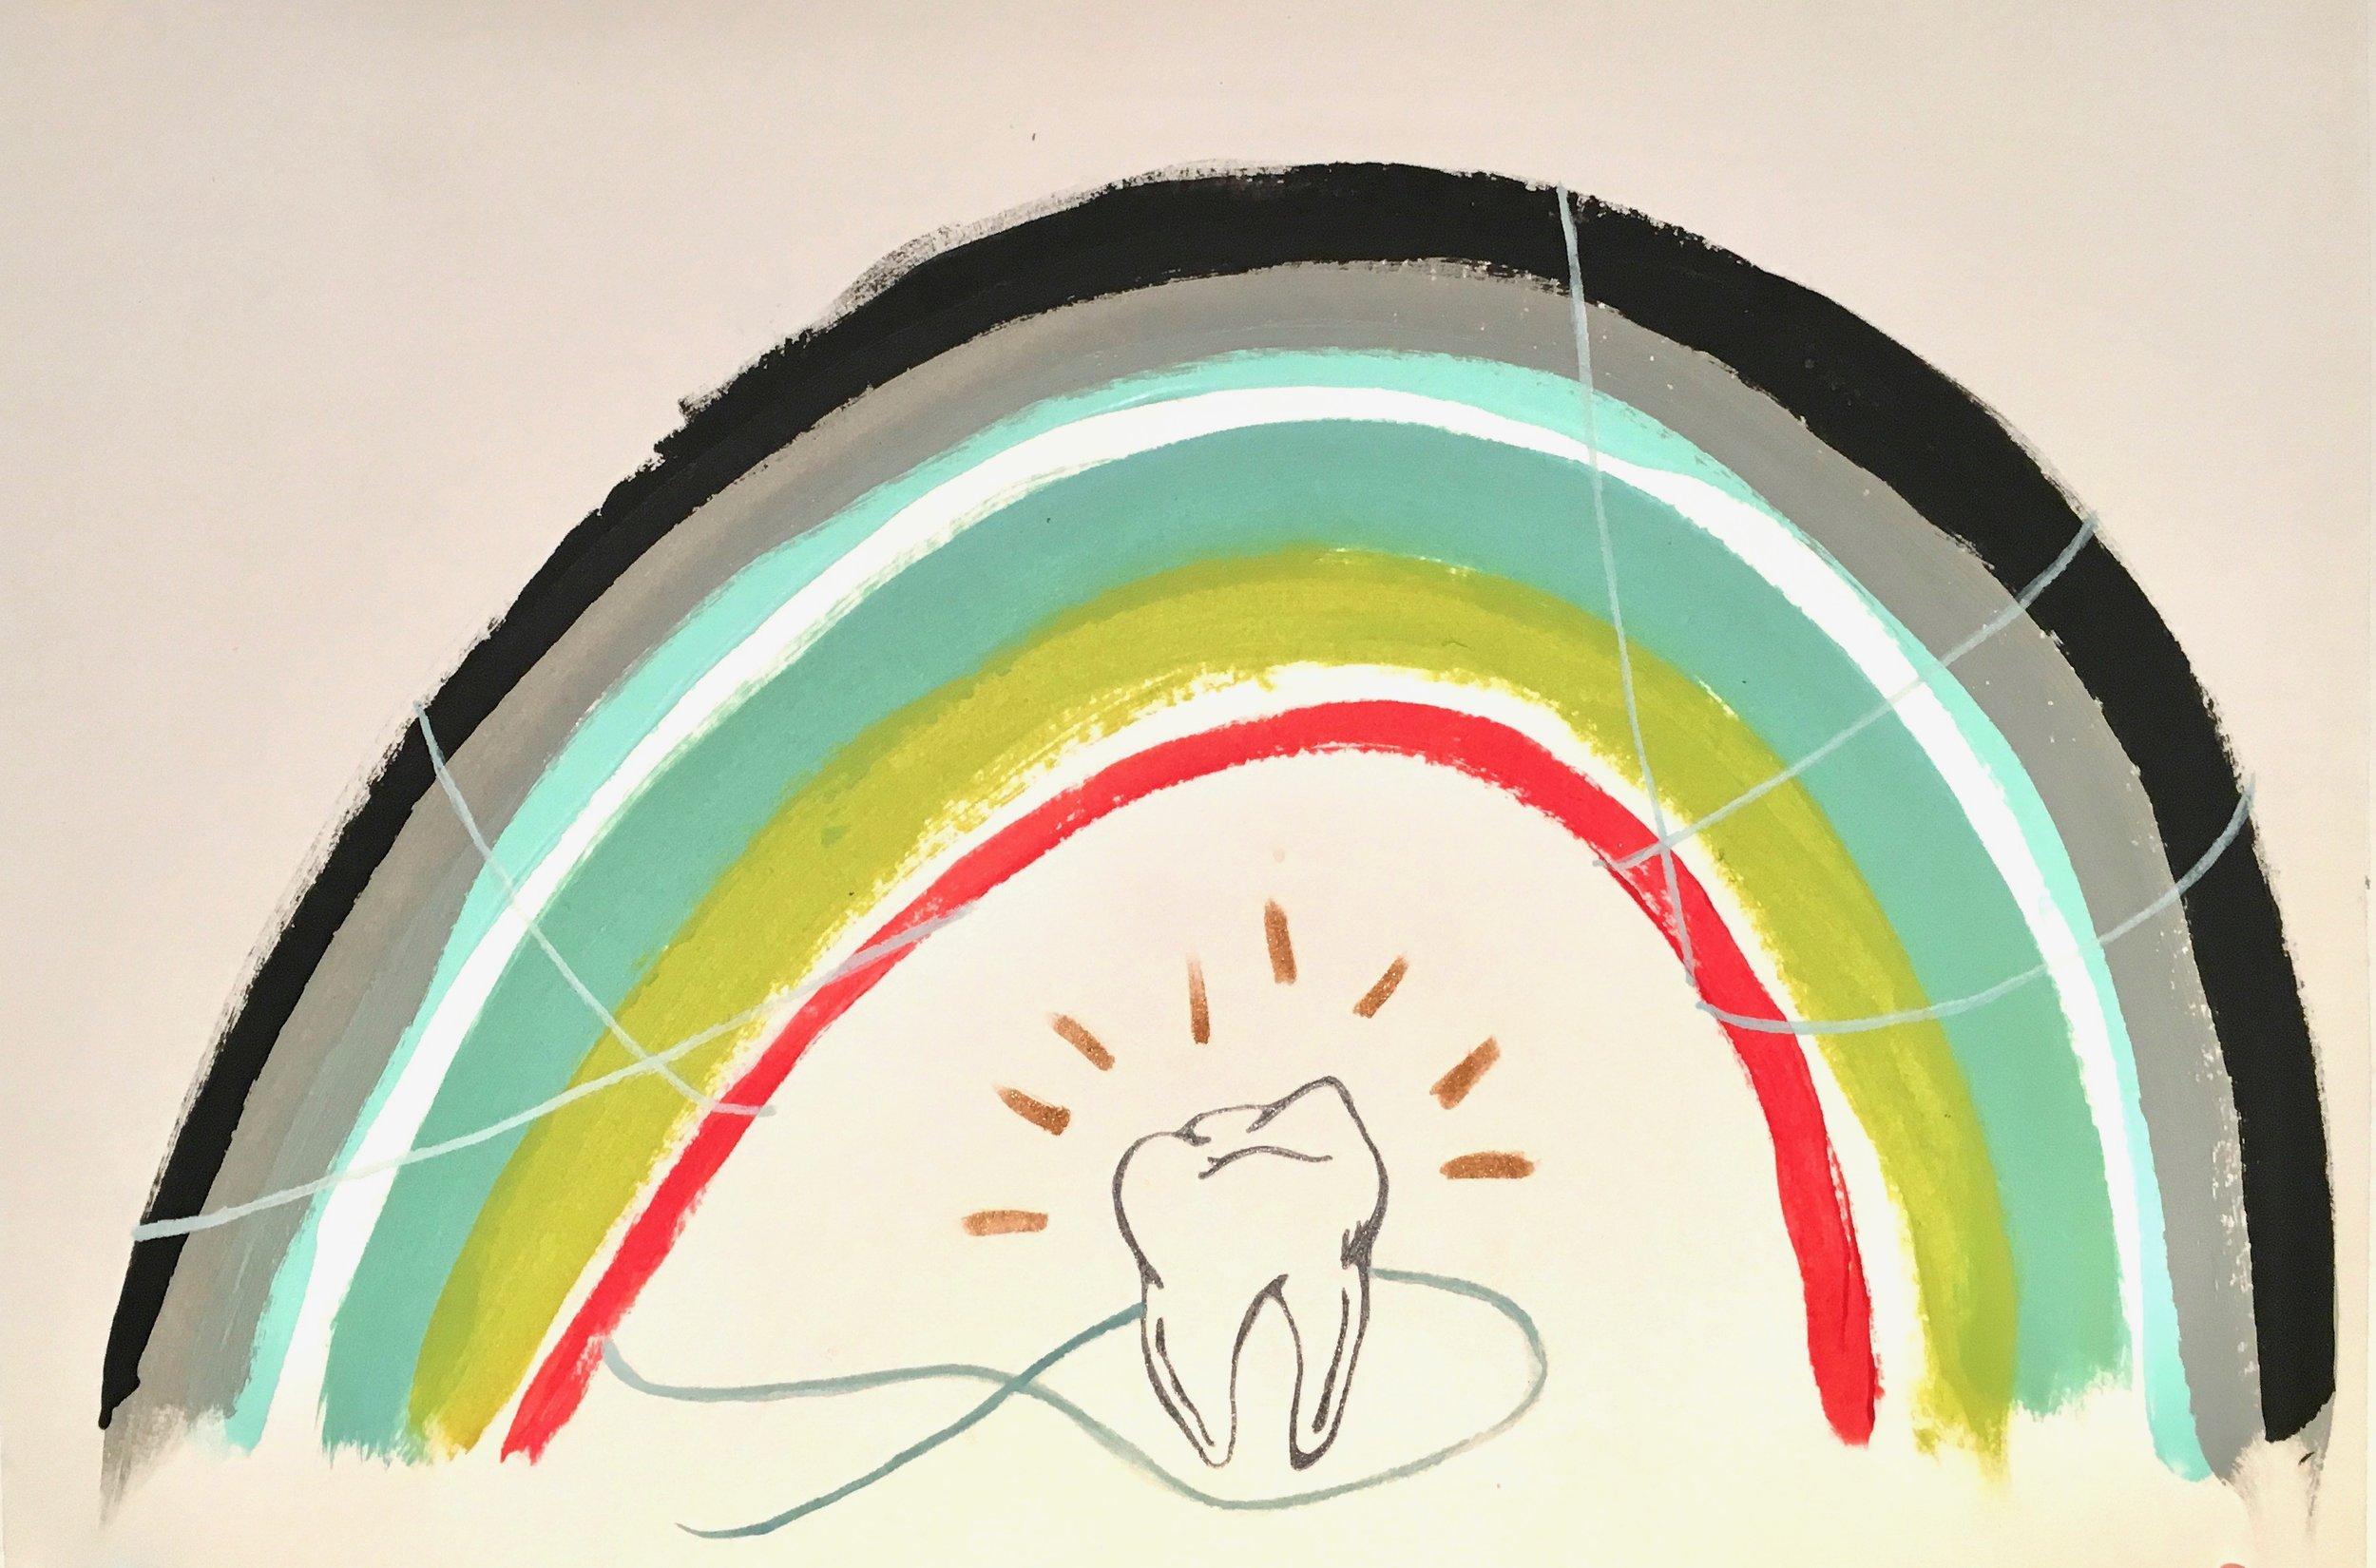 Rainbow of Dental Hygiene (inspired by Patti Smith)